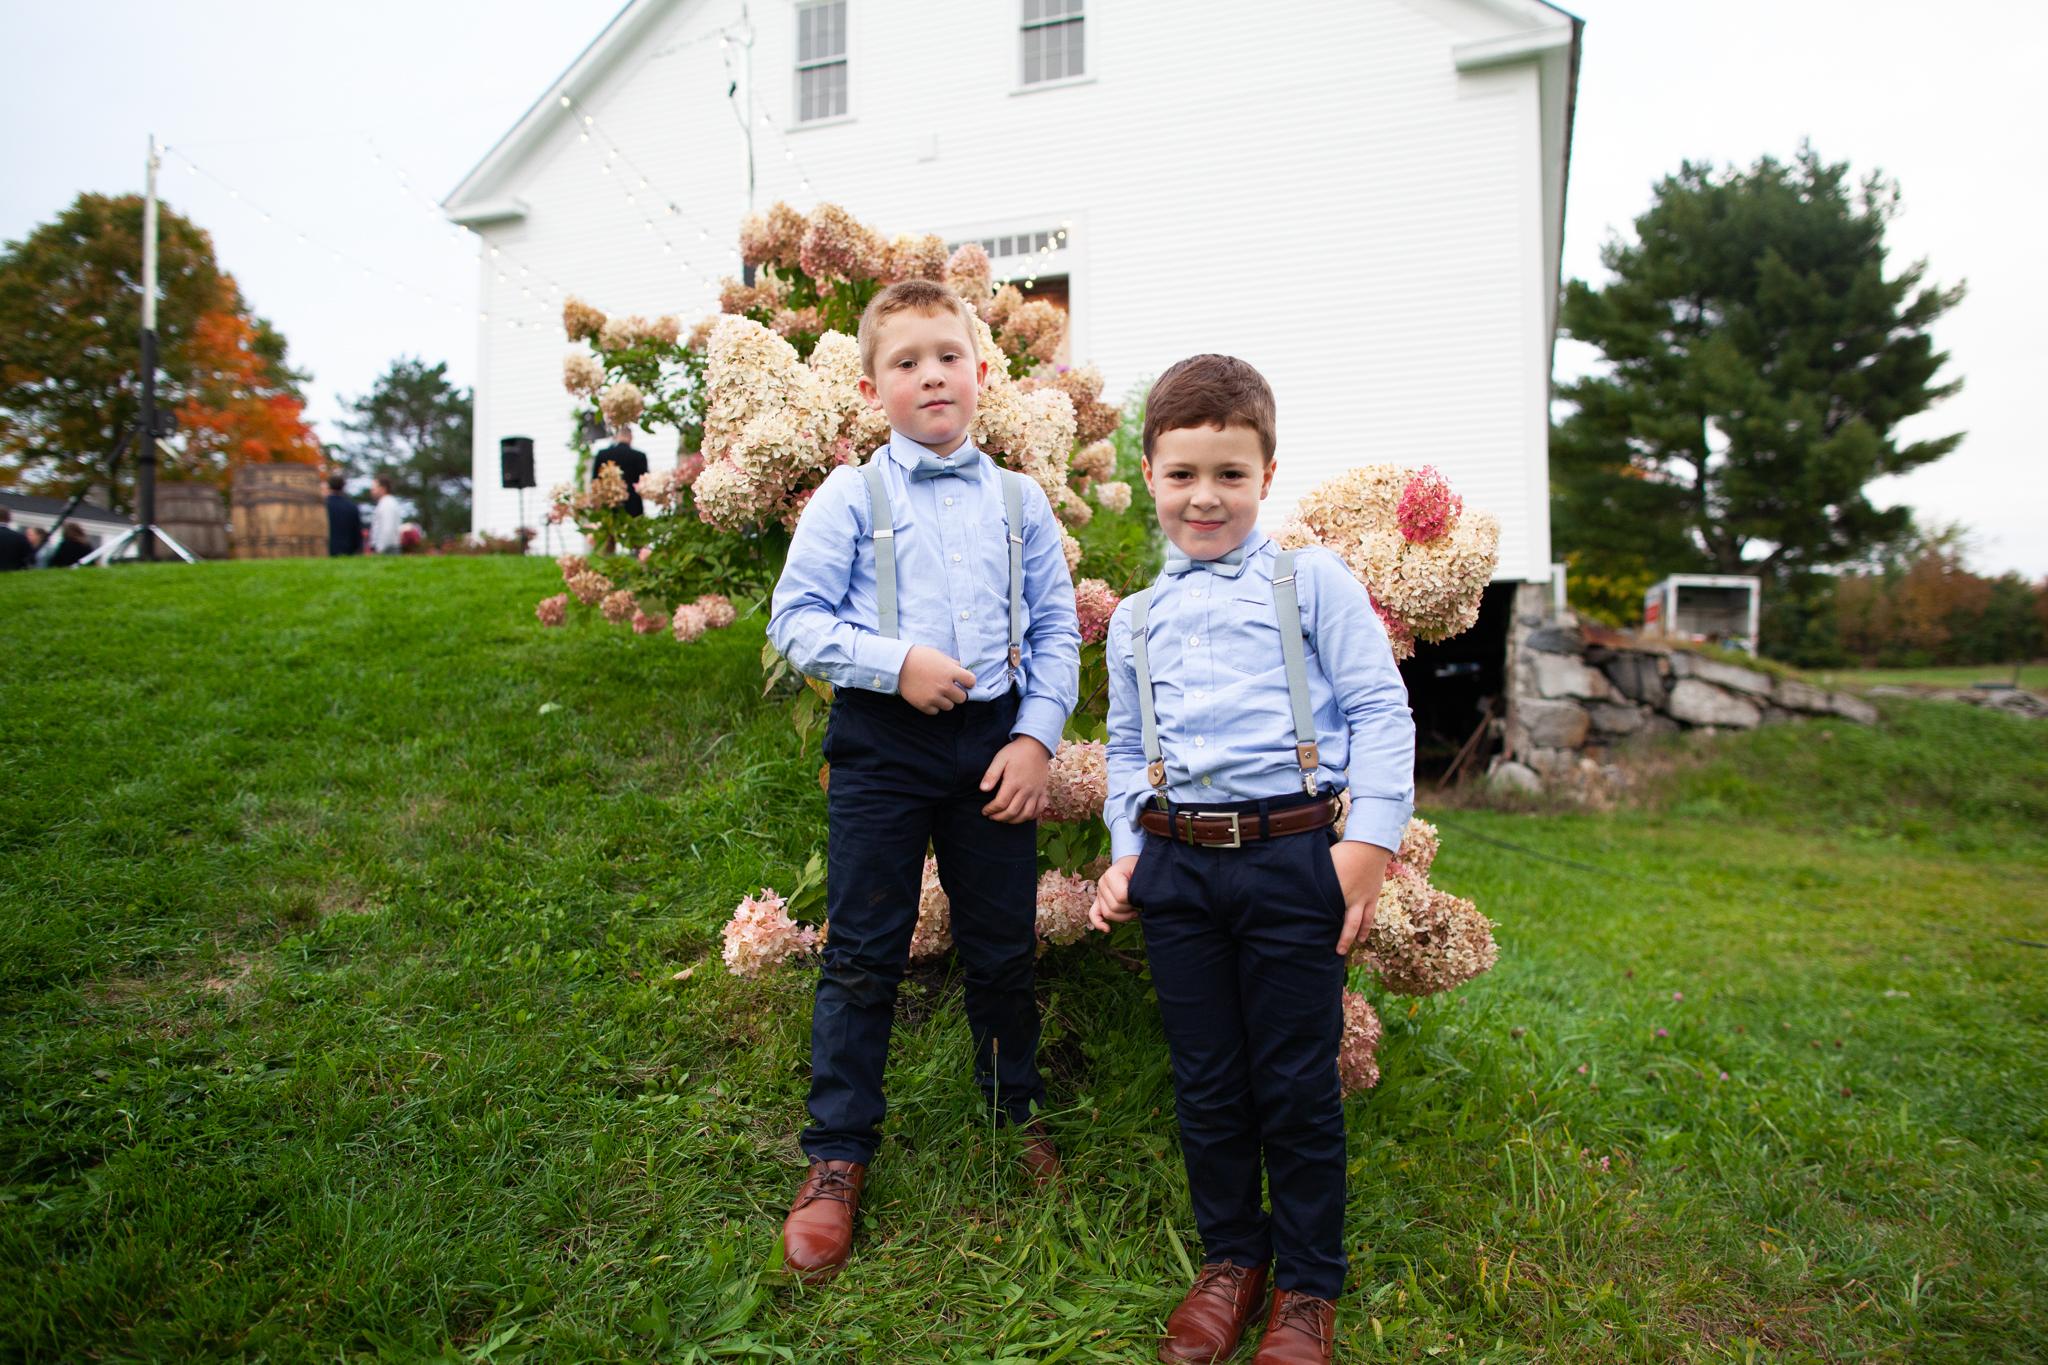 maine-farm-wedding-photographer-stepheneycollins-211.jpg